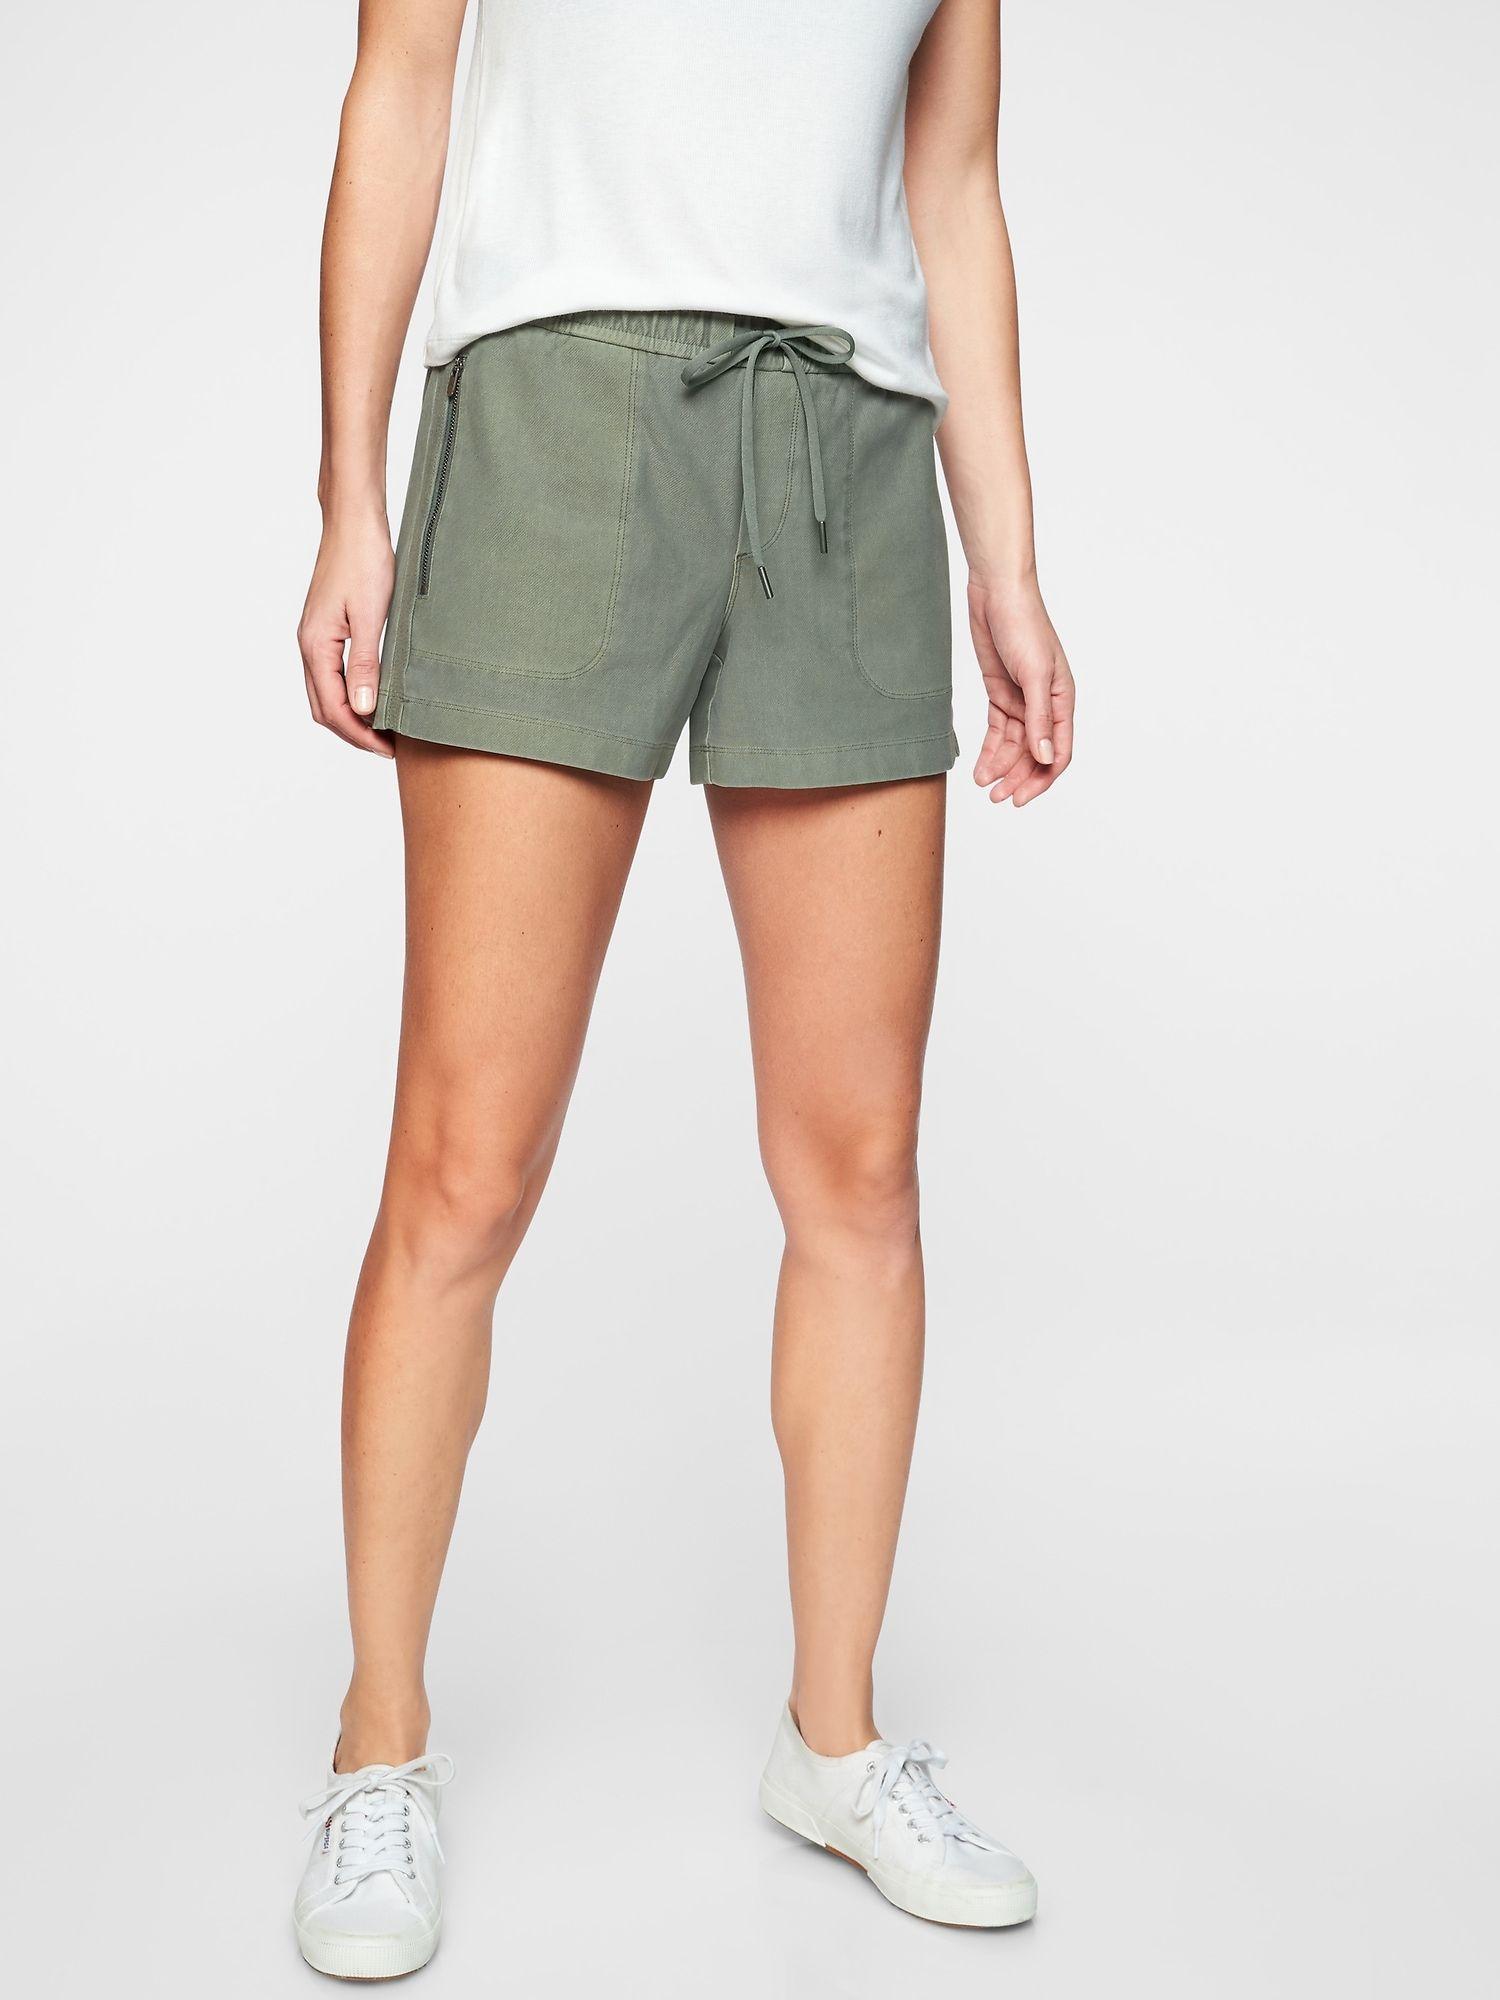 9c3a30d134 Farallon Short in 2019 | Style: Fashion | Comfy shorts, Fashion ...